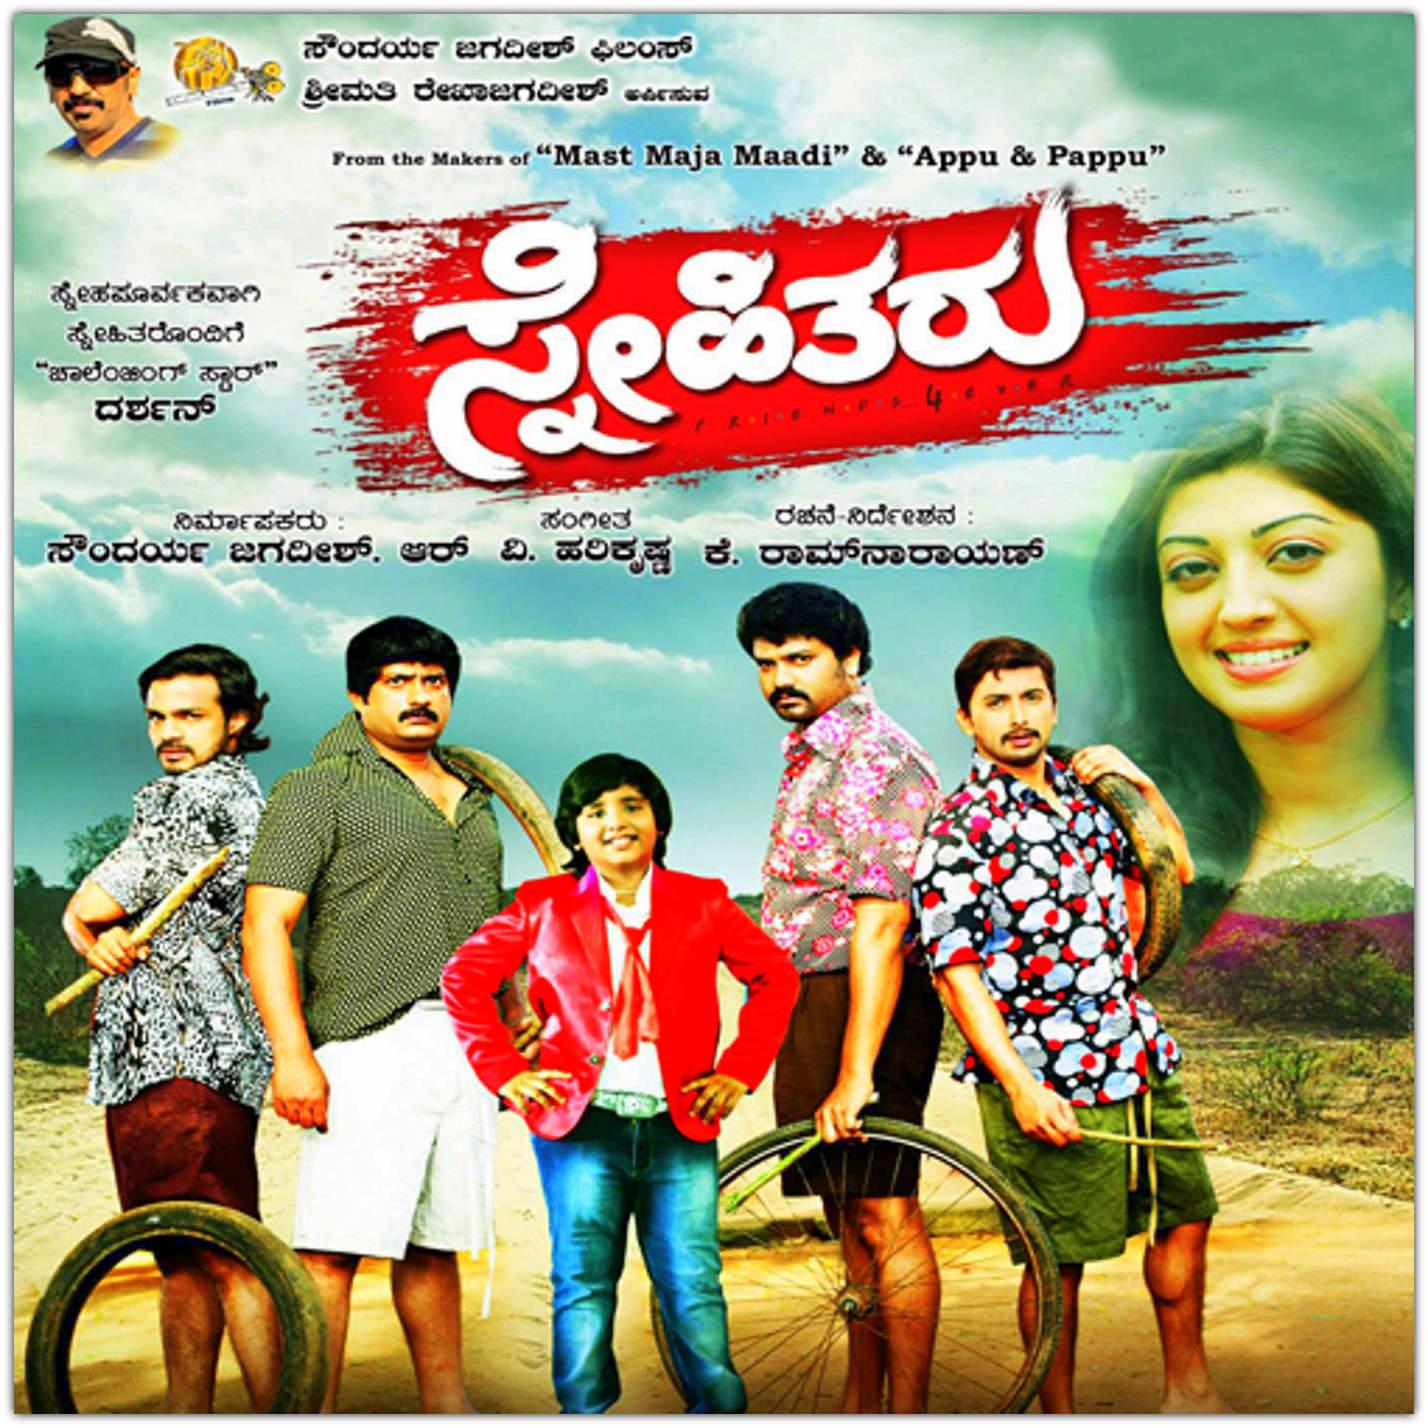 Am A Rider Full Song Download: Kannada Mp3 Songs: Snehitharu (2012) Kannada Movie Mp3 Songs